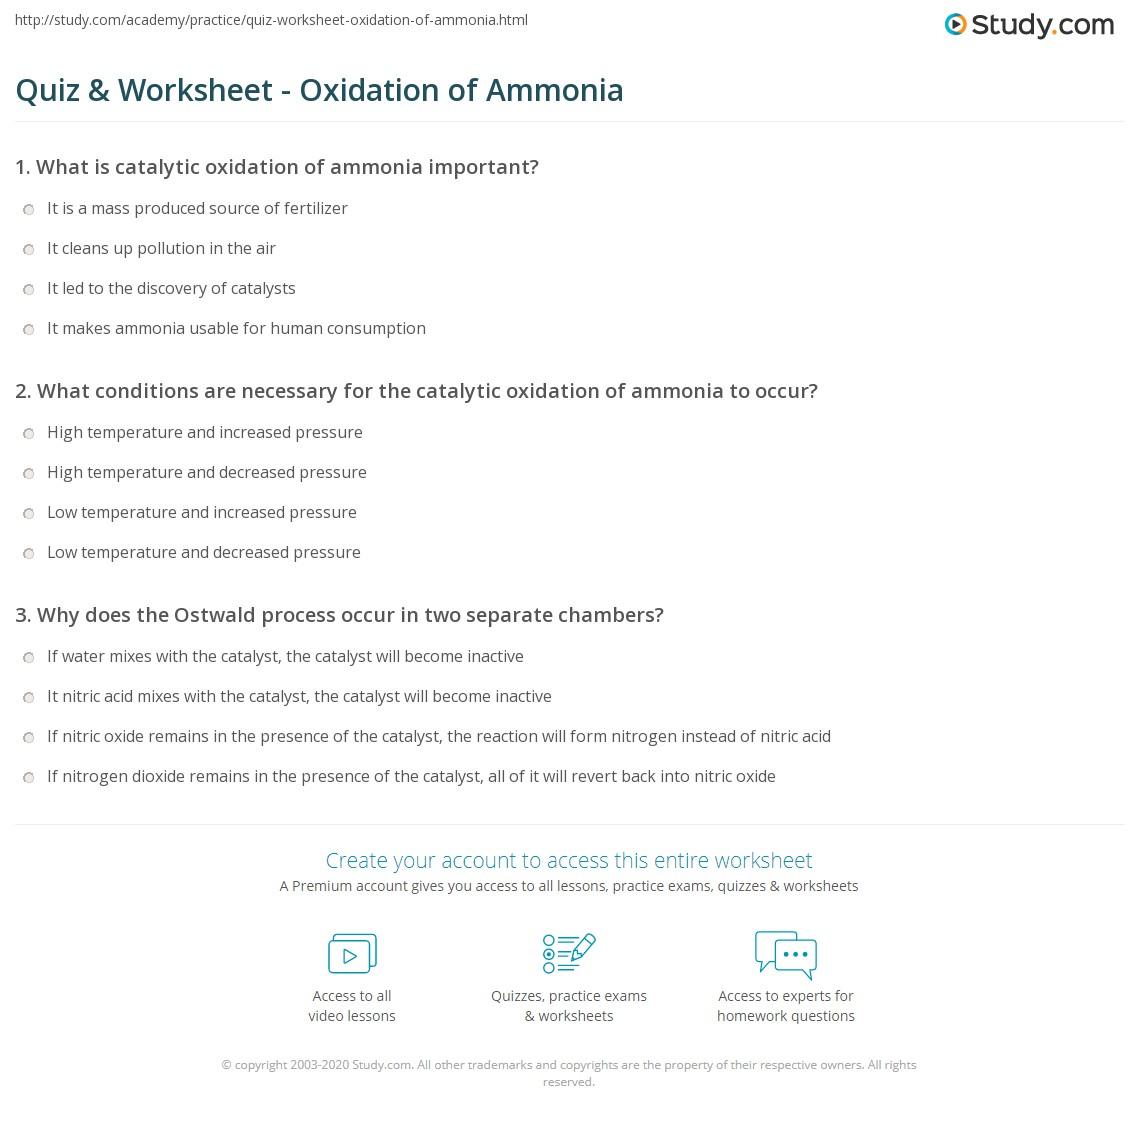 Quiz & Worksheet - Oxidation of Ammonia | Study.com